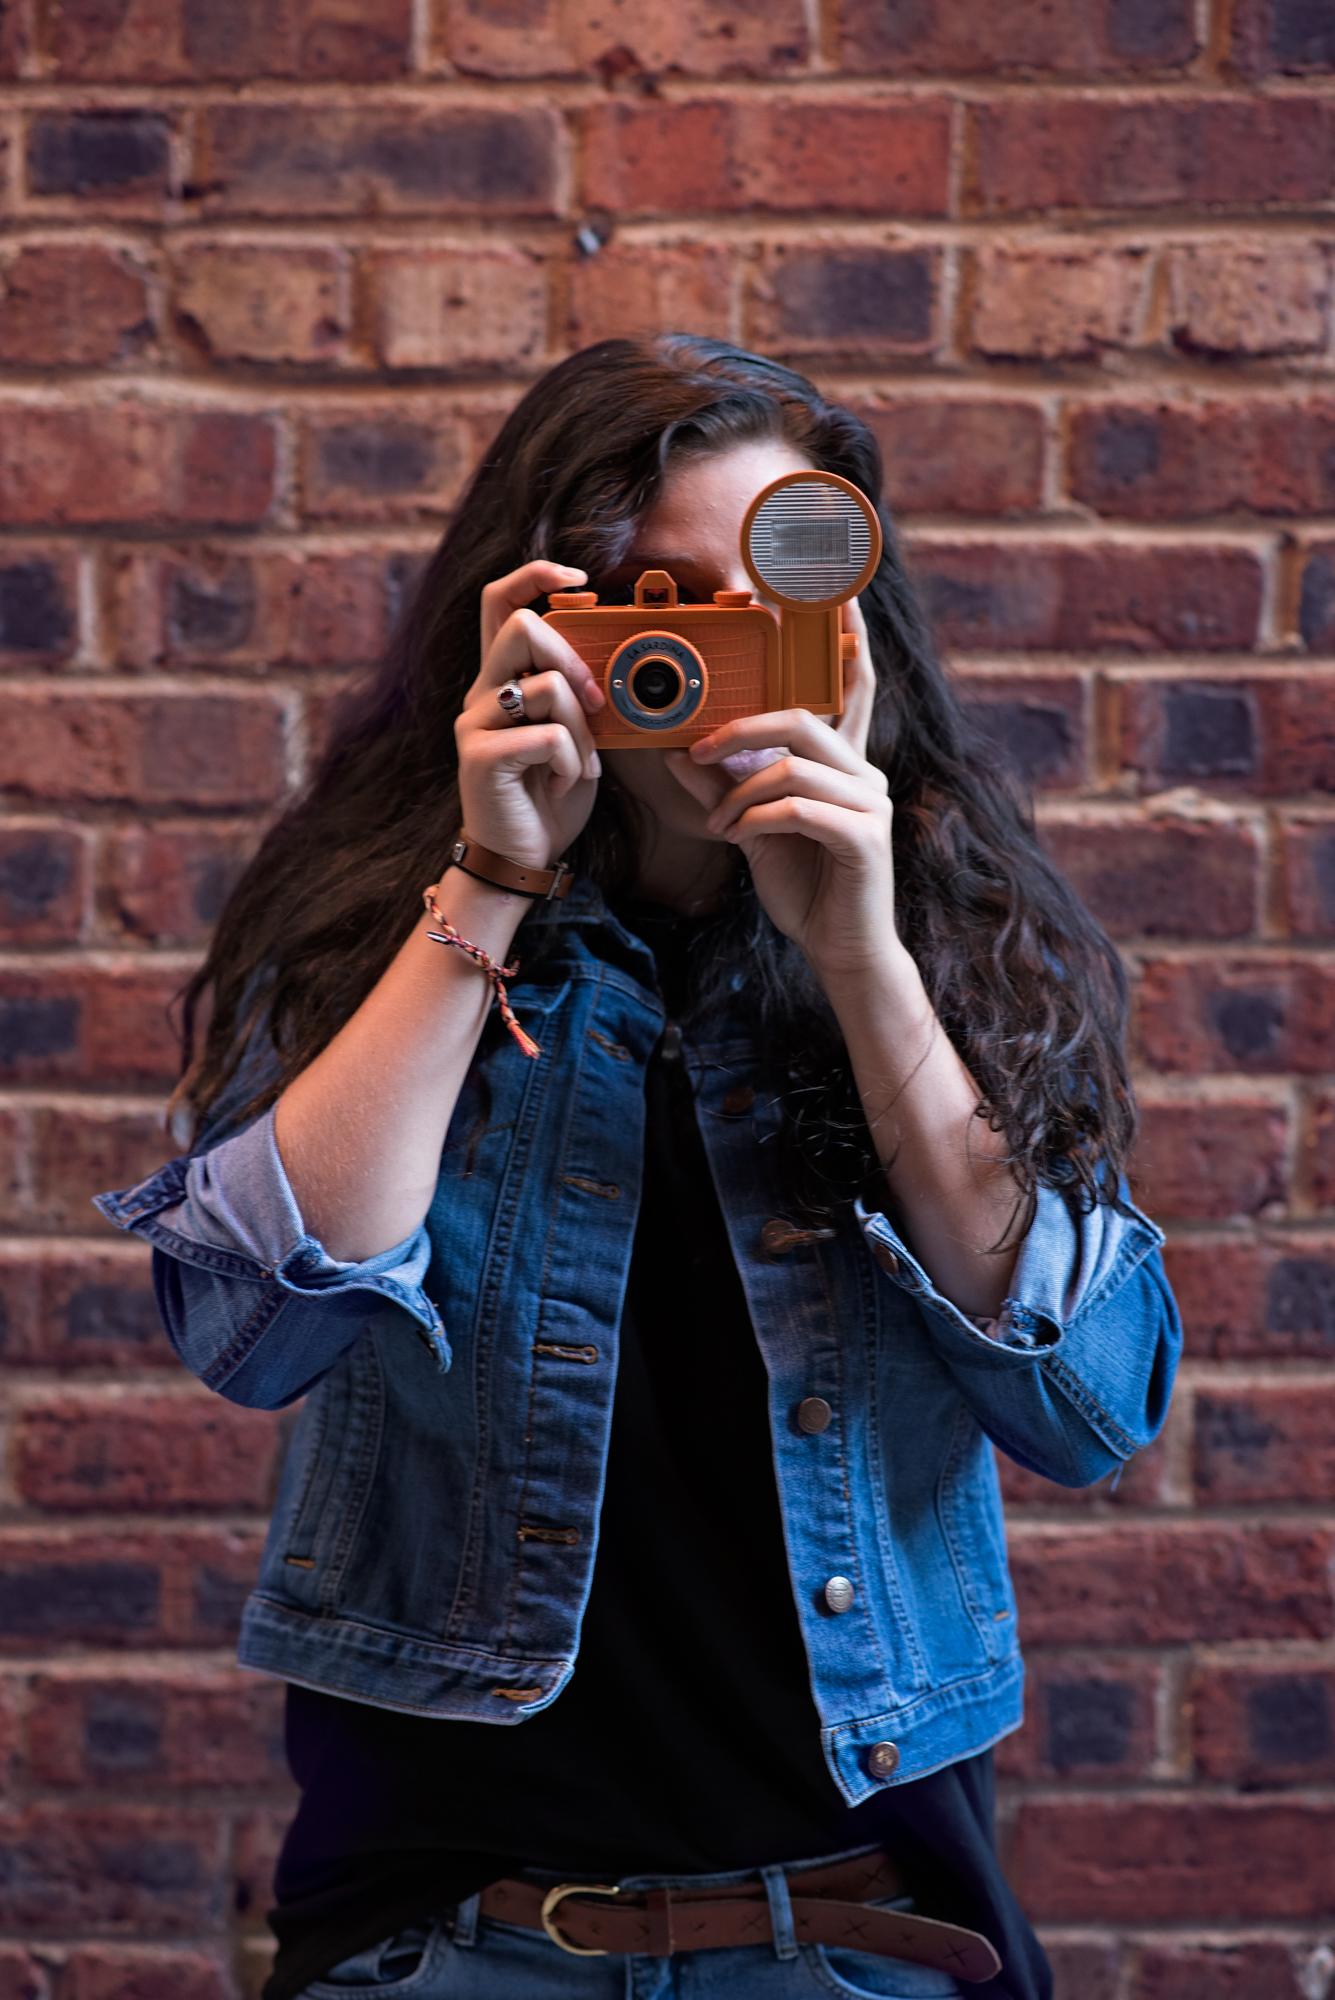 kimberly-danielle-portraits-senior-bowen-39.jpg